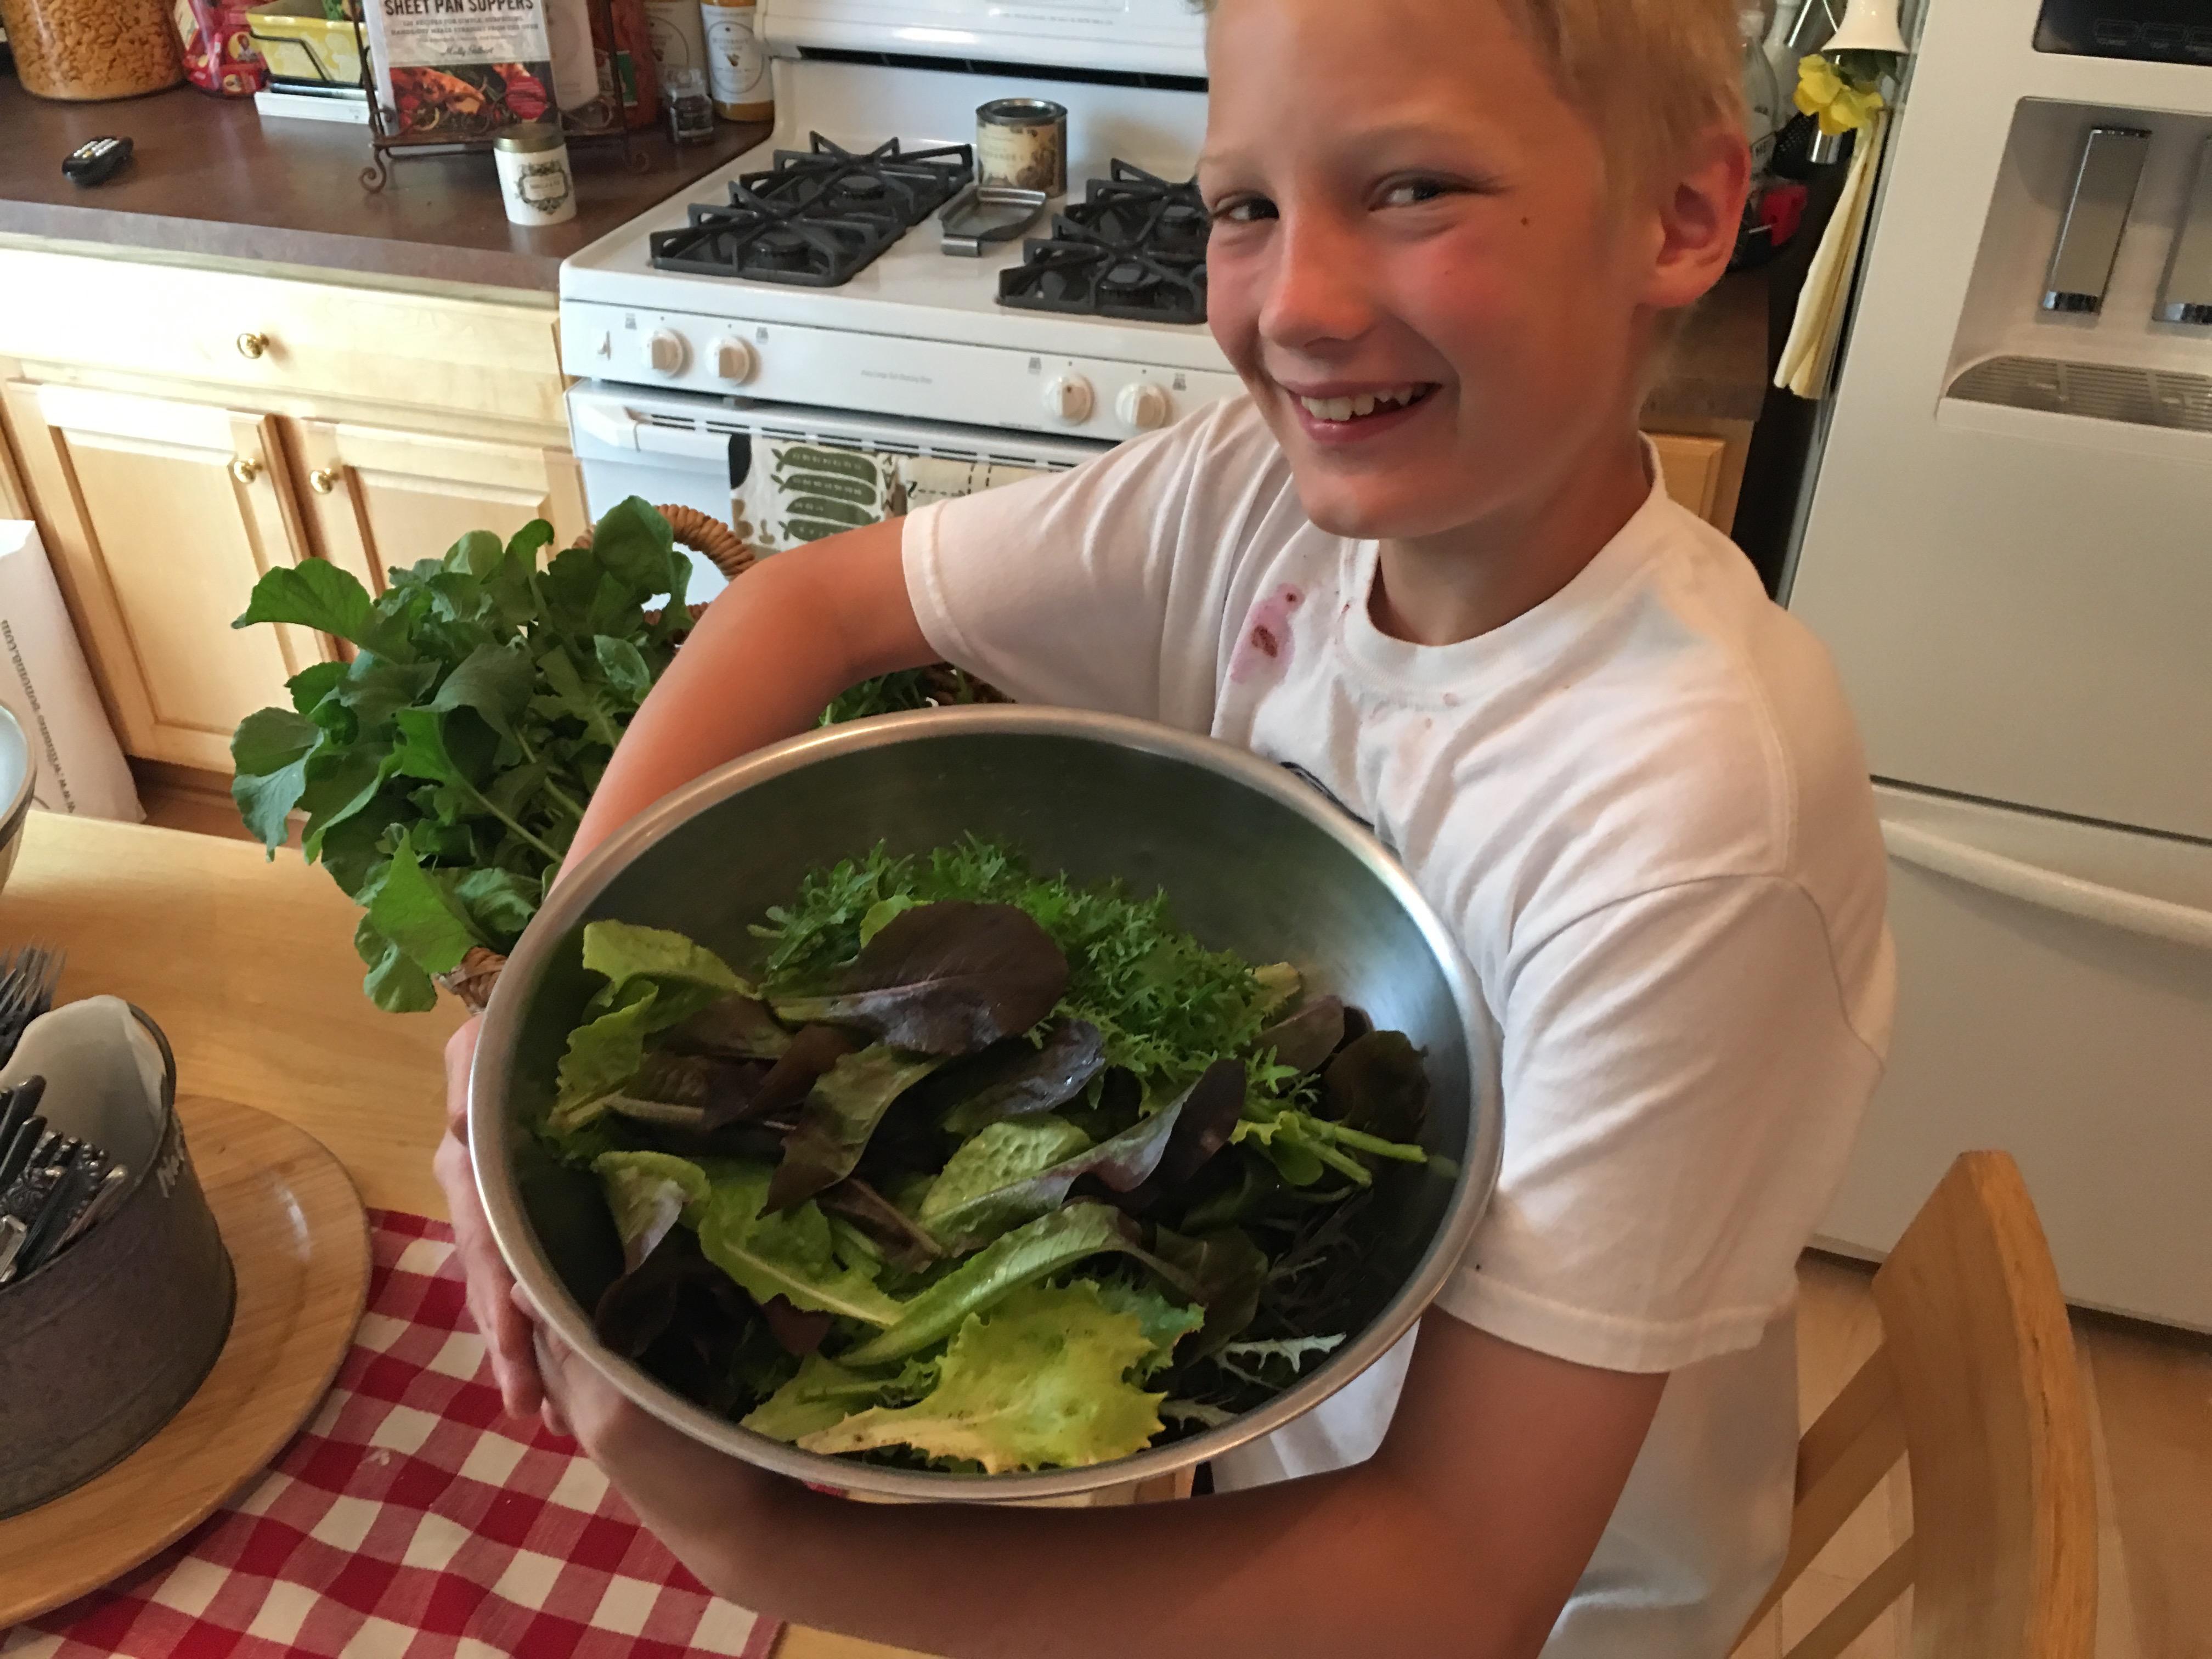 John harvesting lettuce and salad greens for supper 6ftmama blog